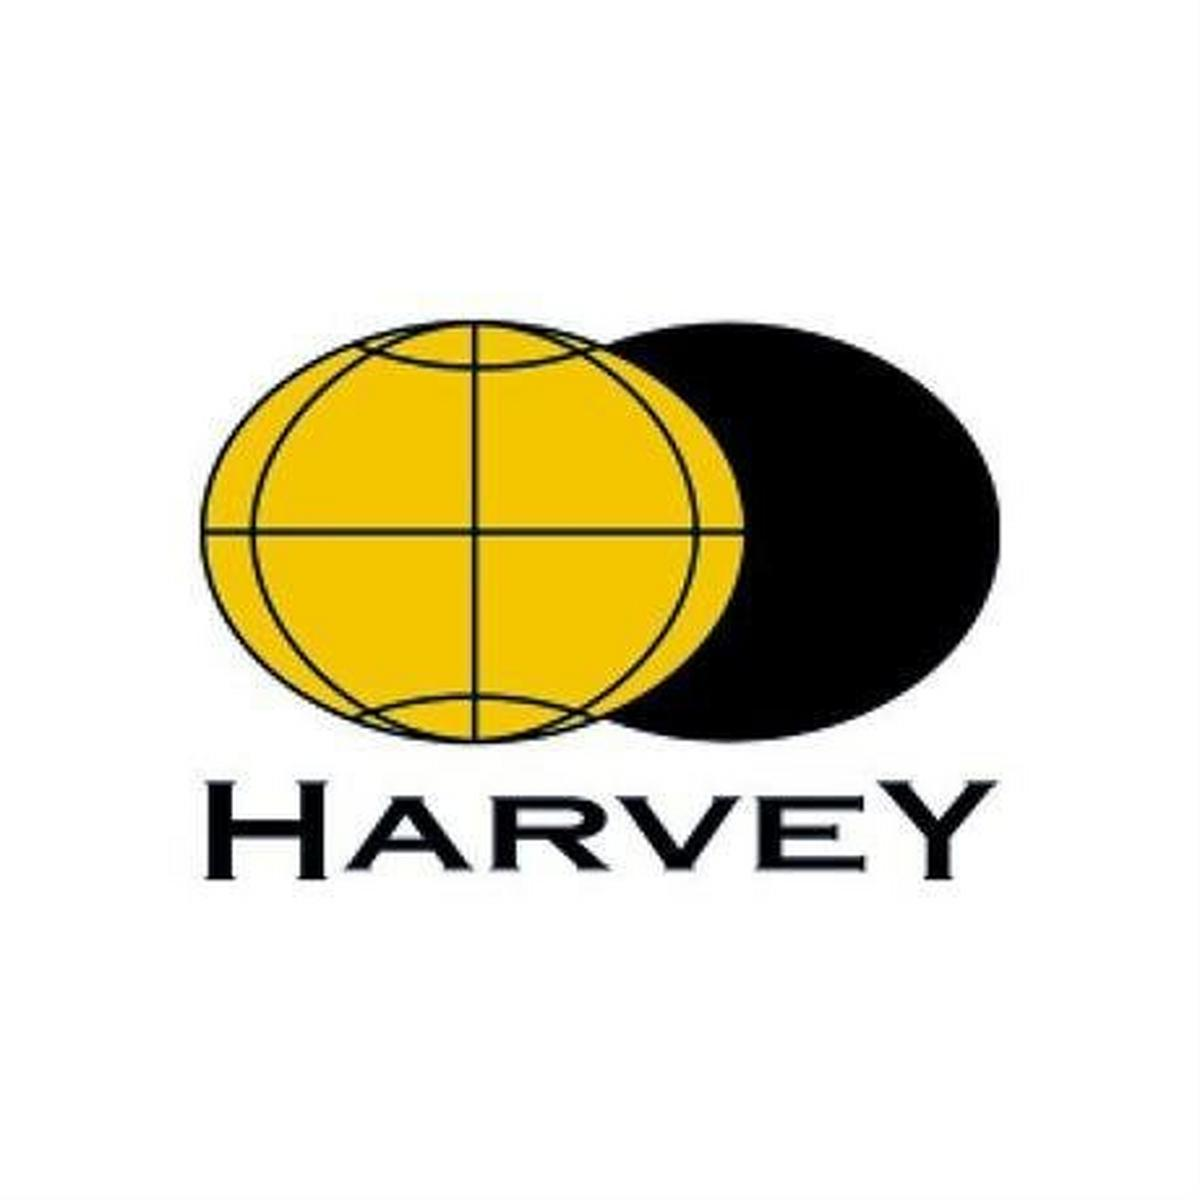 Harveys Harvey Map: Gerry Charnley Round